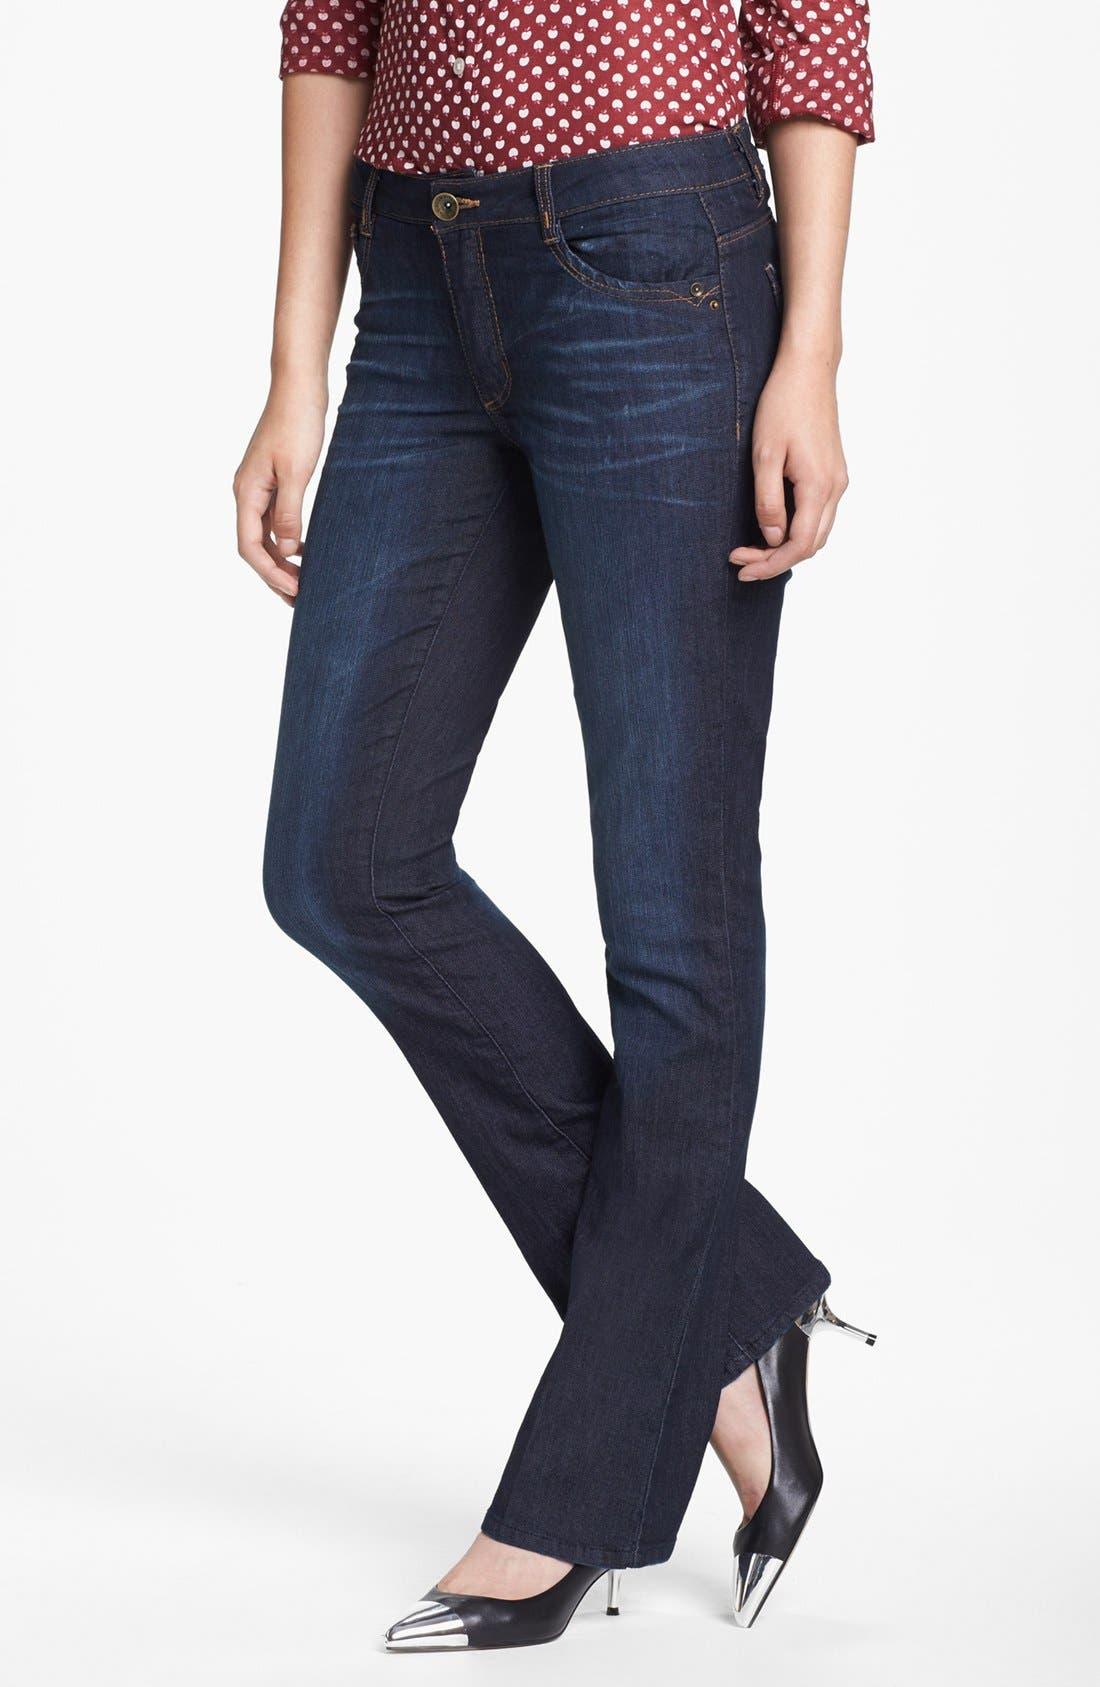 Alternate Image 1  - Wit & Wisdom 'Itty Bitty' Bootcut Jeans (Indigo) (Nordstrom Exclusive)